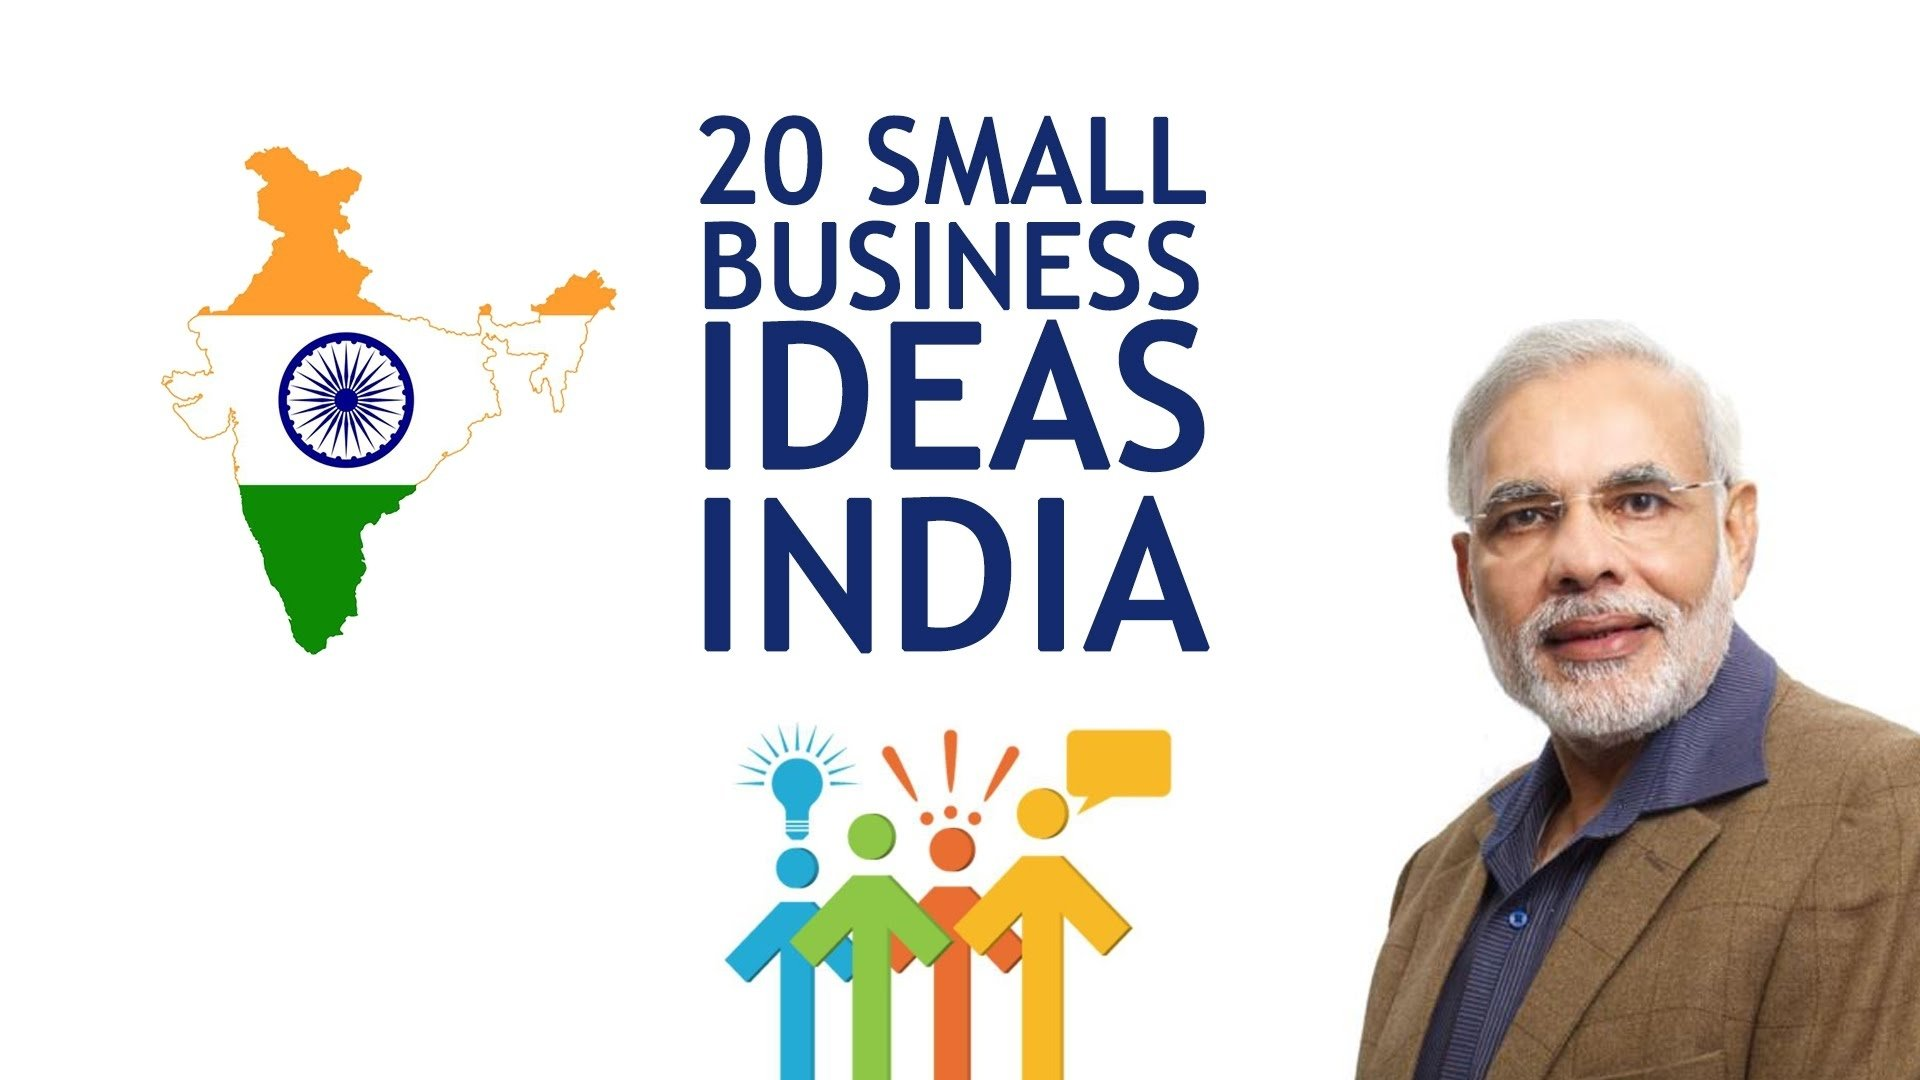 10 Lovely Best Home Based Business Ideas opulent best home based business ideas top 20 small in india new 1 2020